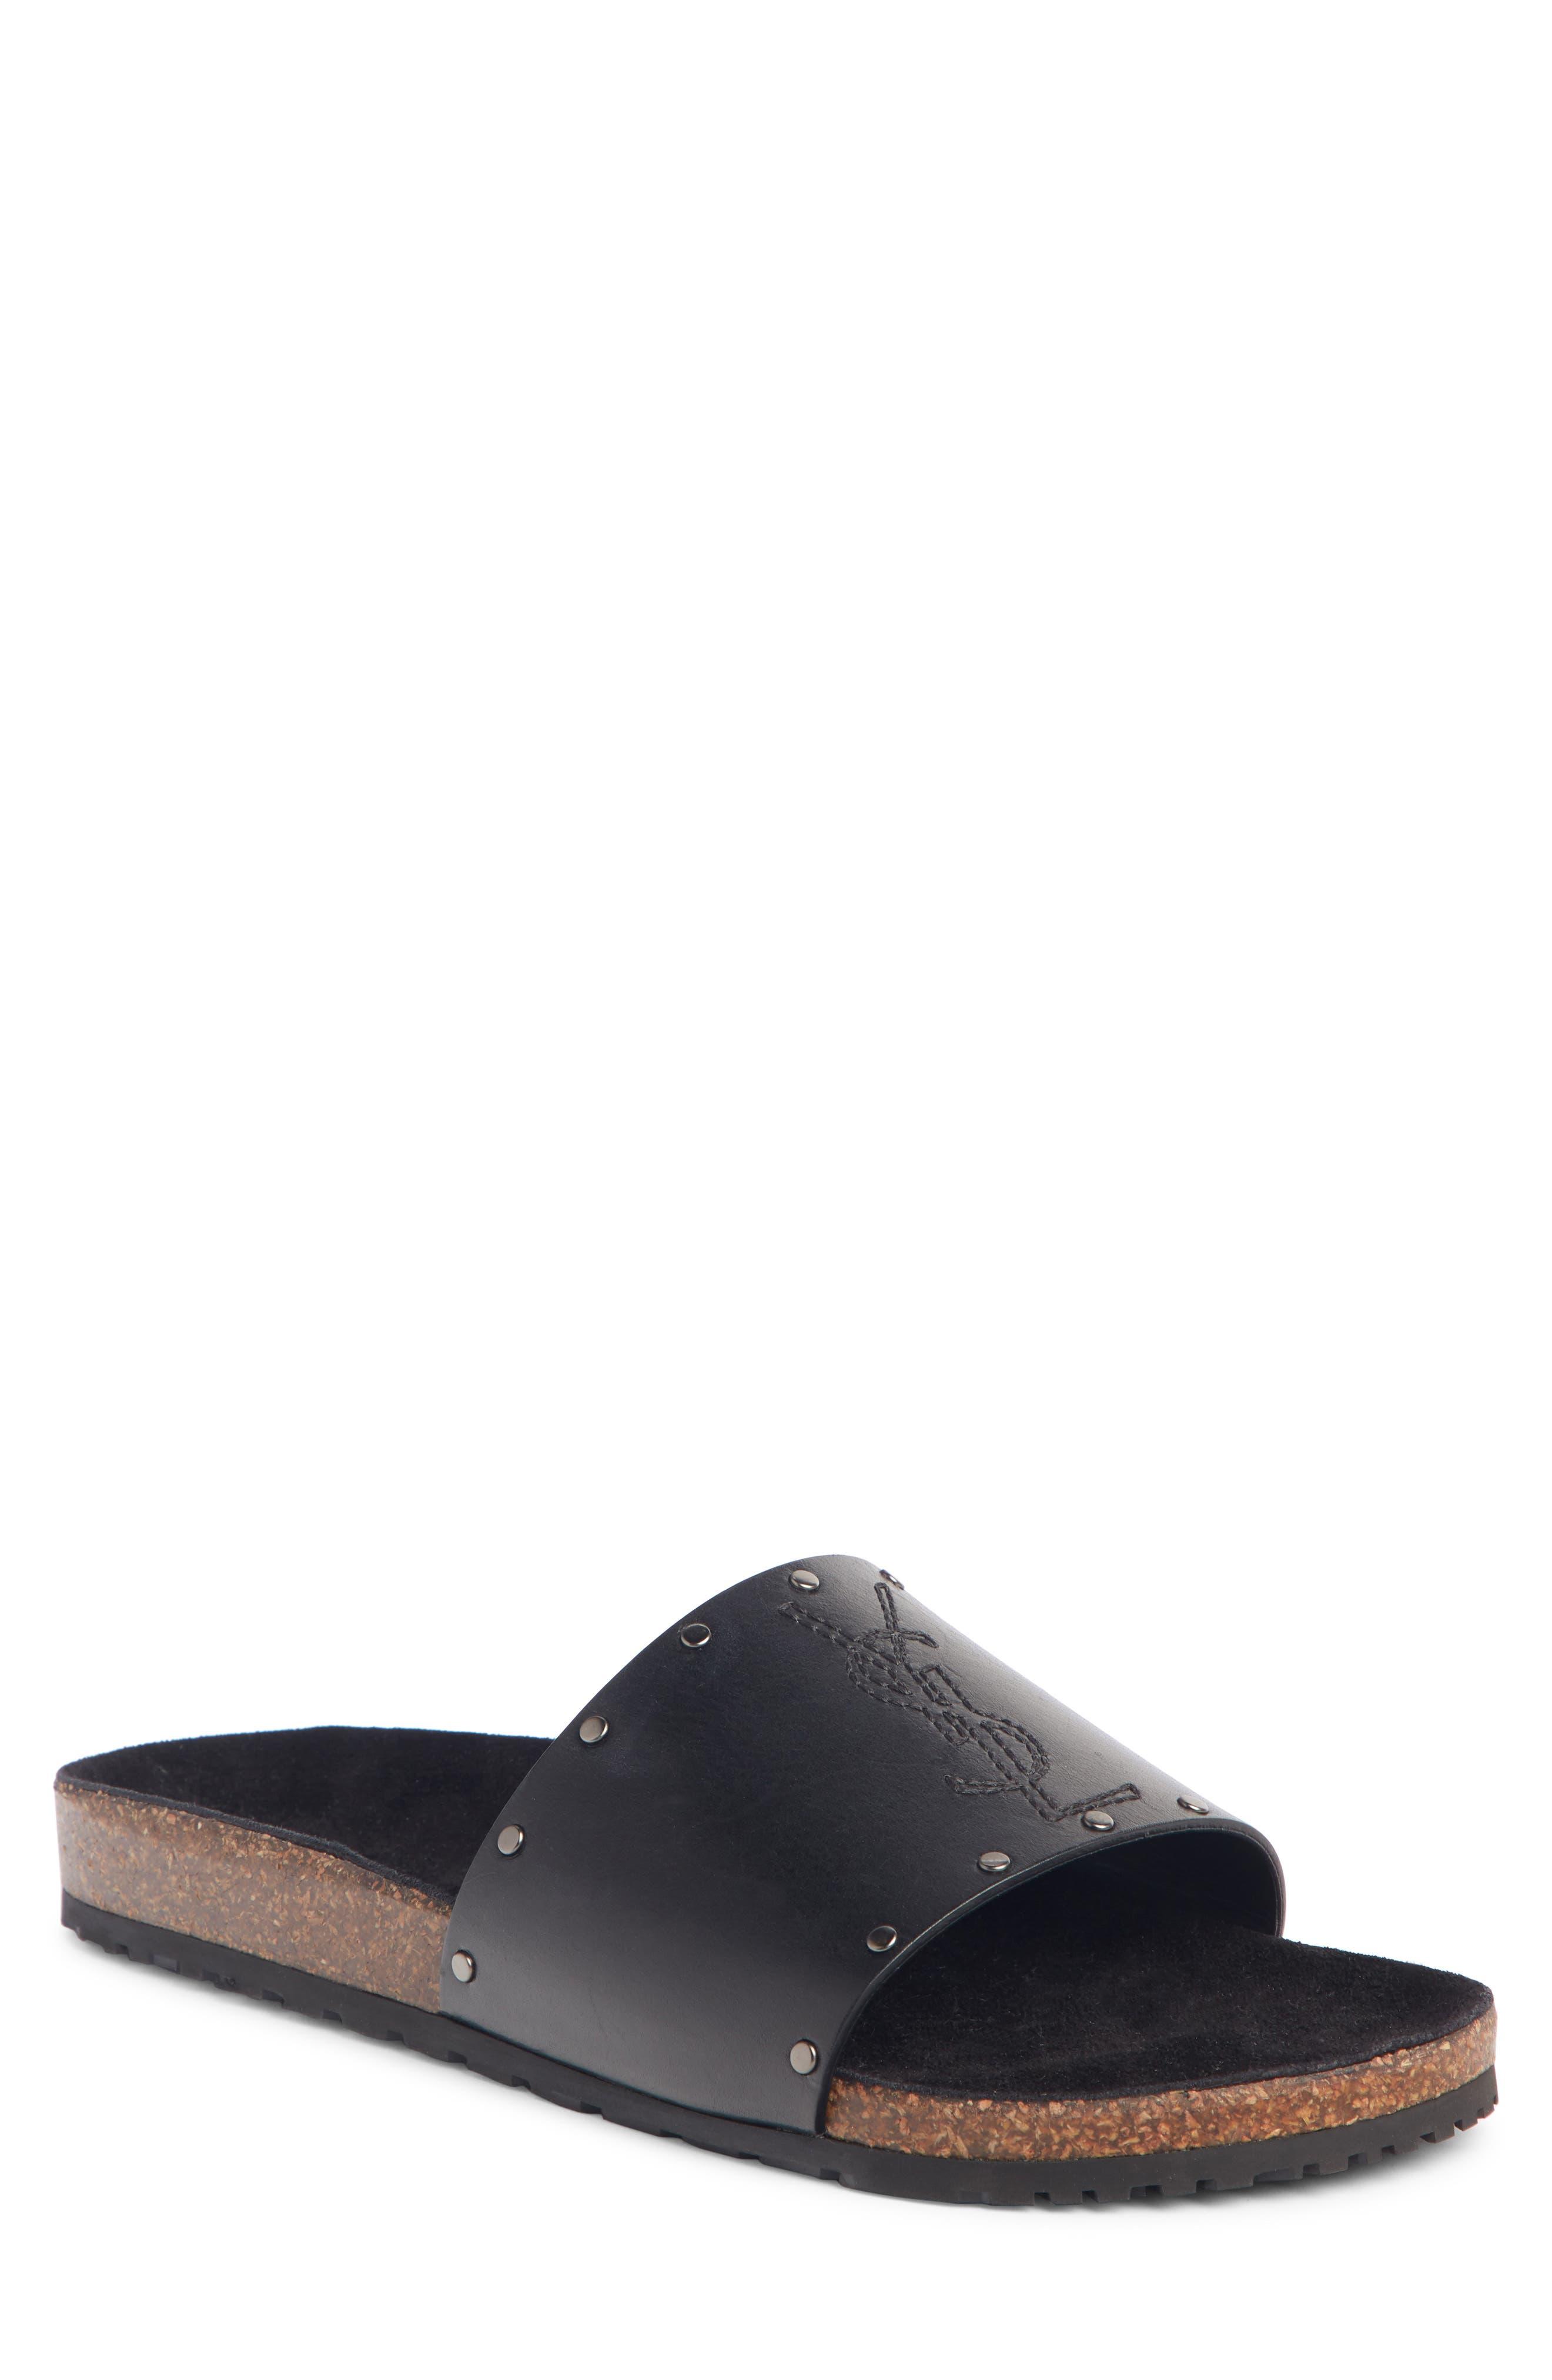 SAINT LAURENT Jimmy Slide Sandal, Main, color, NERO/ NERO